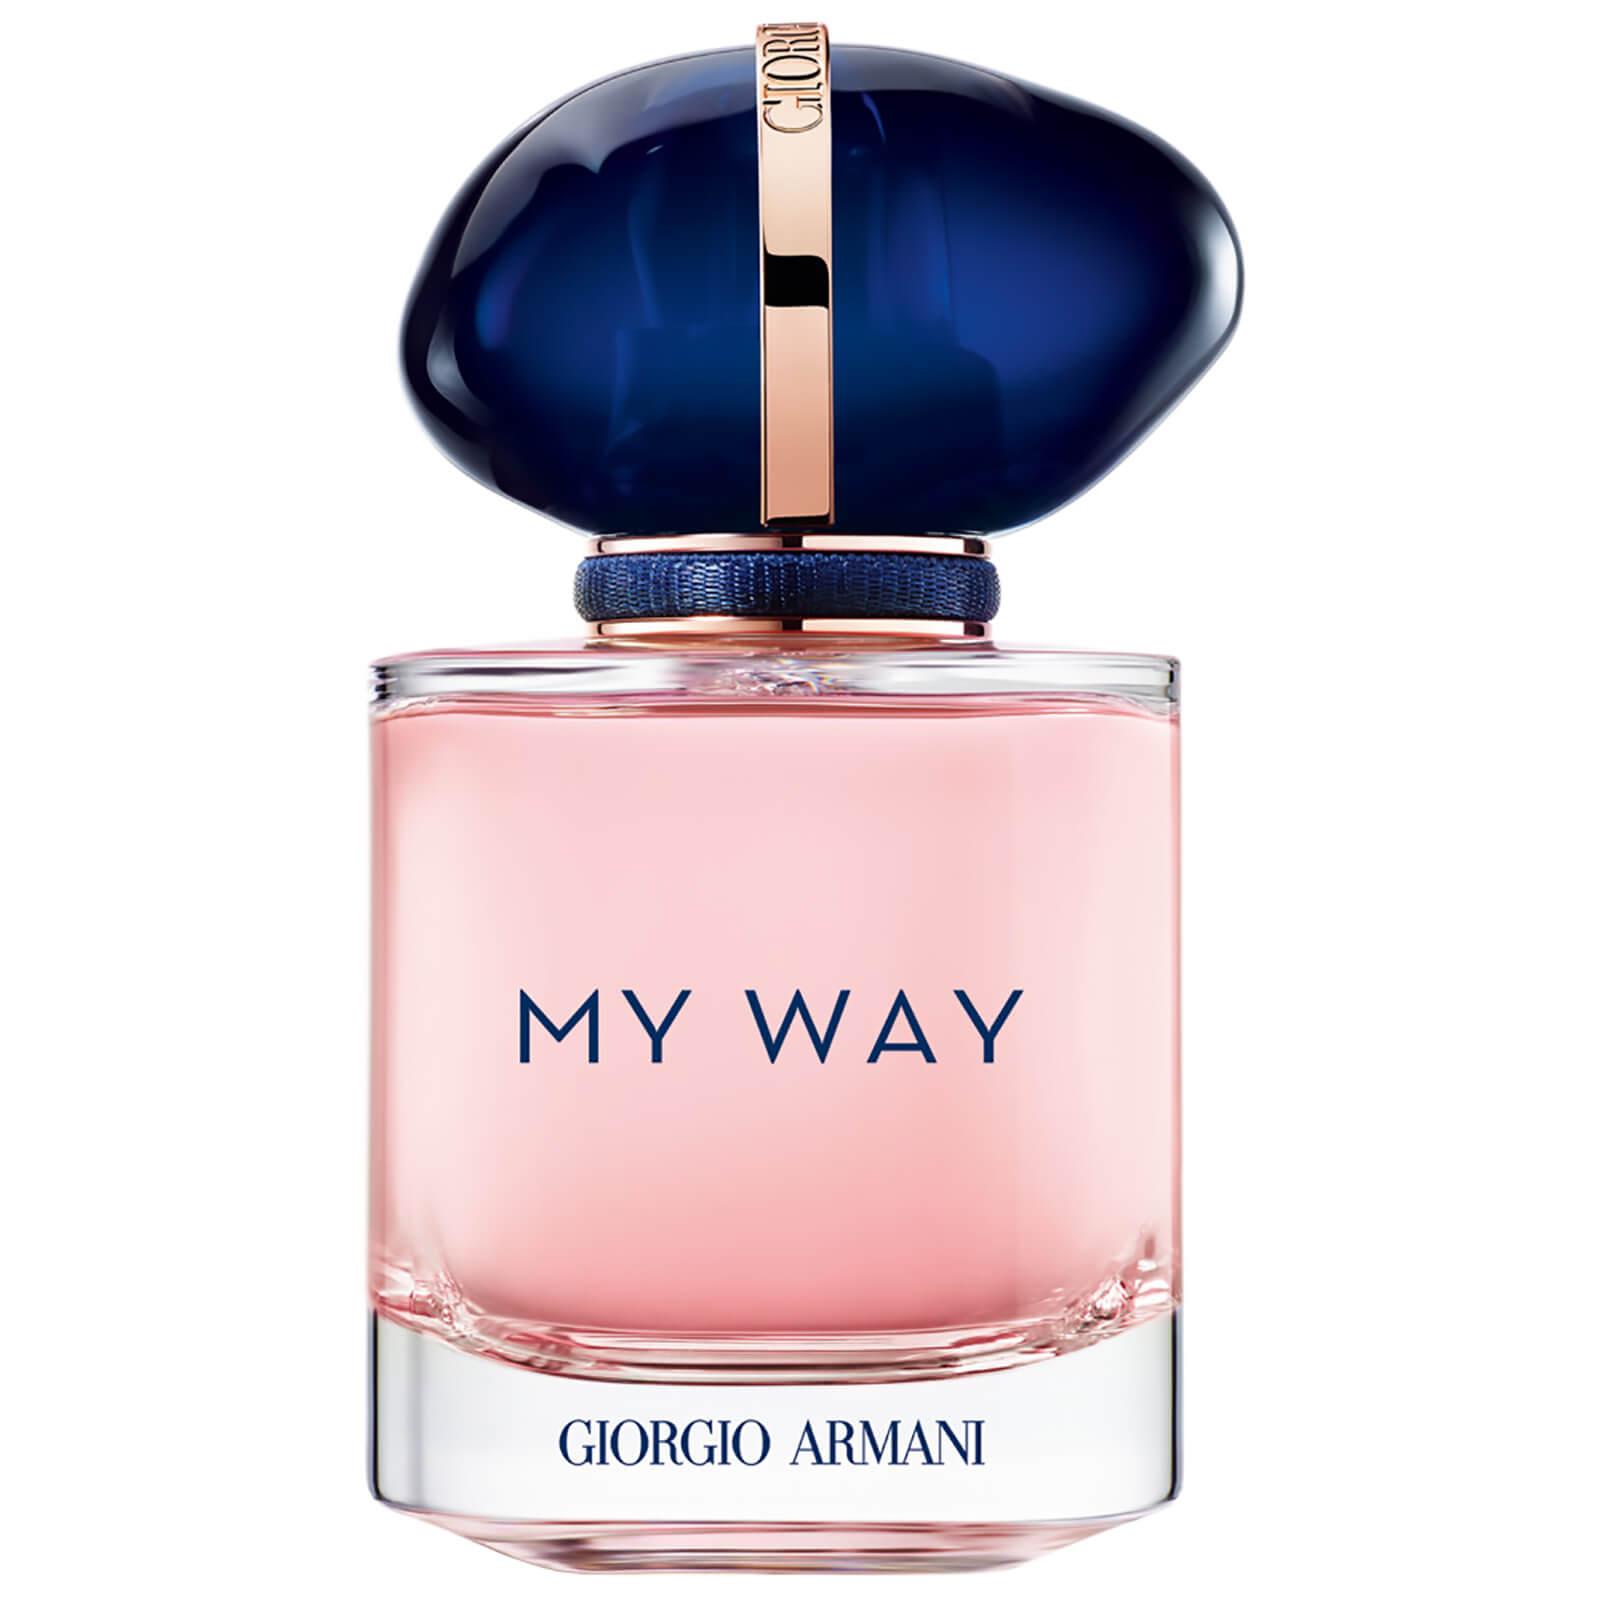 GIORGIO_ARMANI_MY_WAY